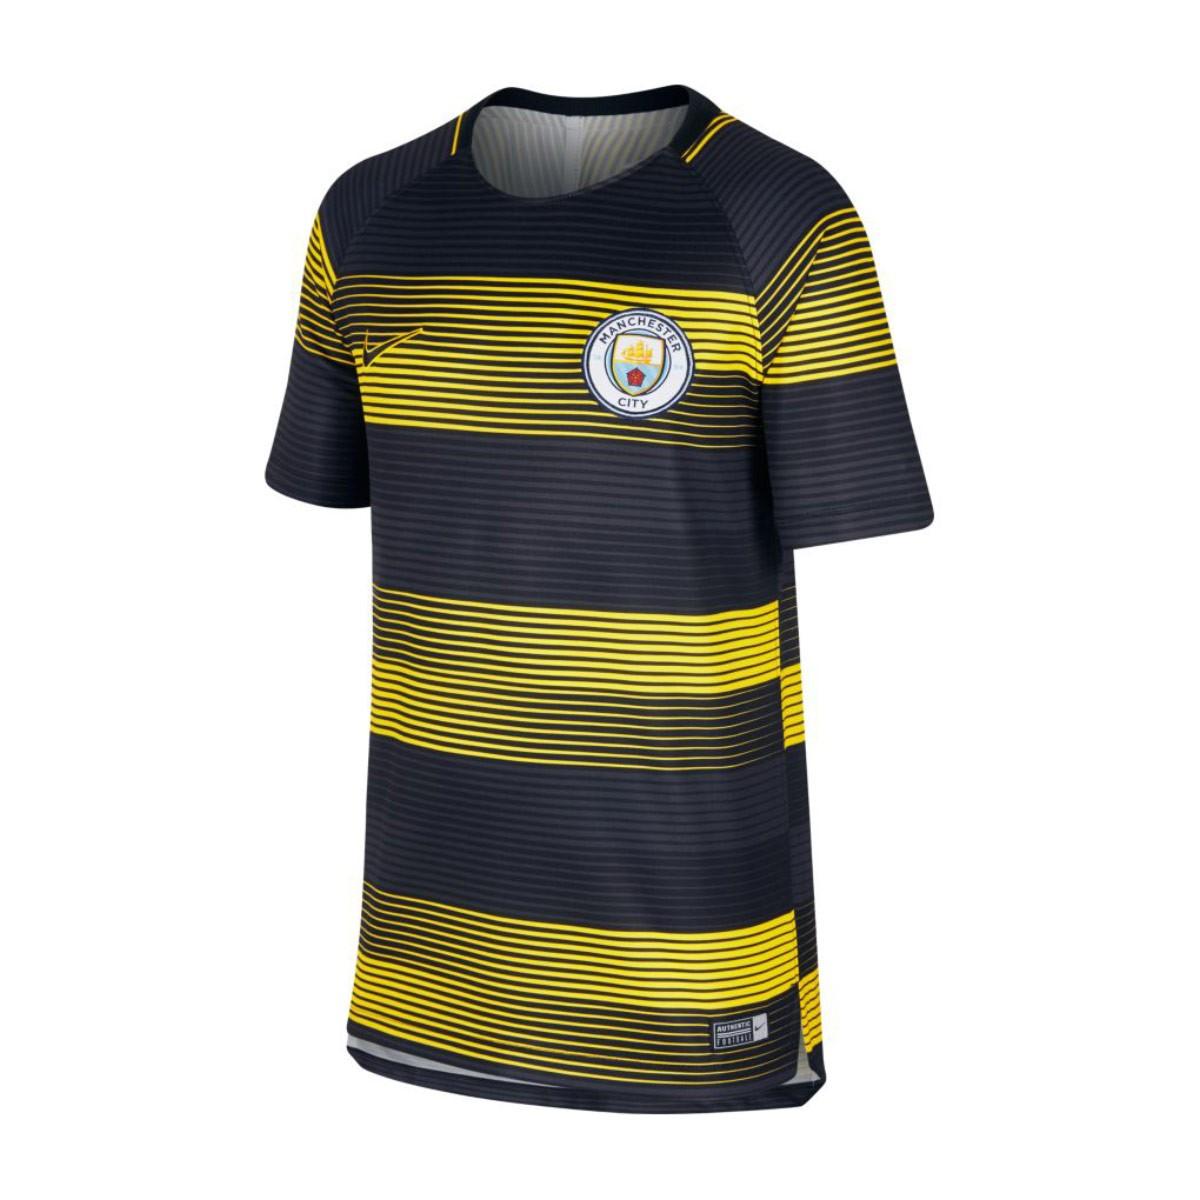 dc3bfe0c37dd1 Jersey Nike Manchester City FC Dry Squad SS GX 2 2018-2019 Niño ...